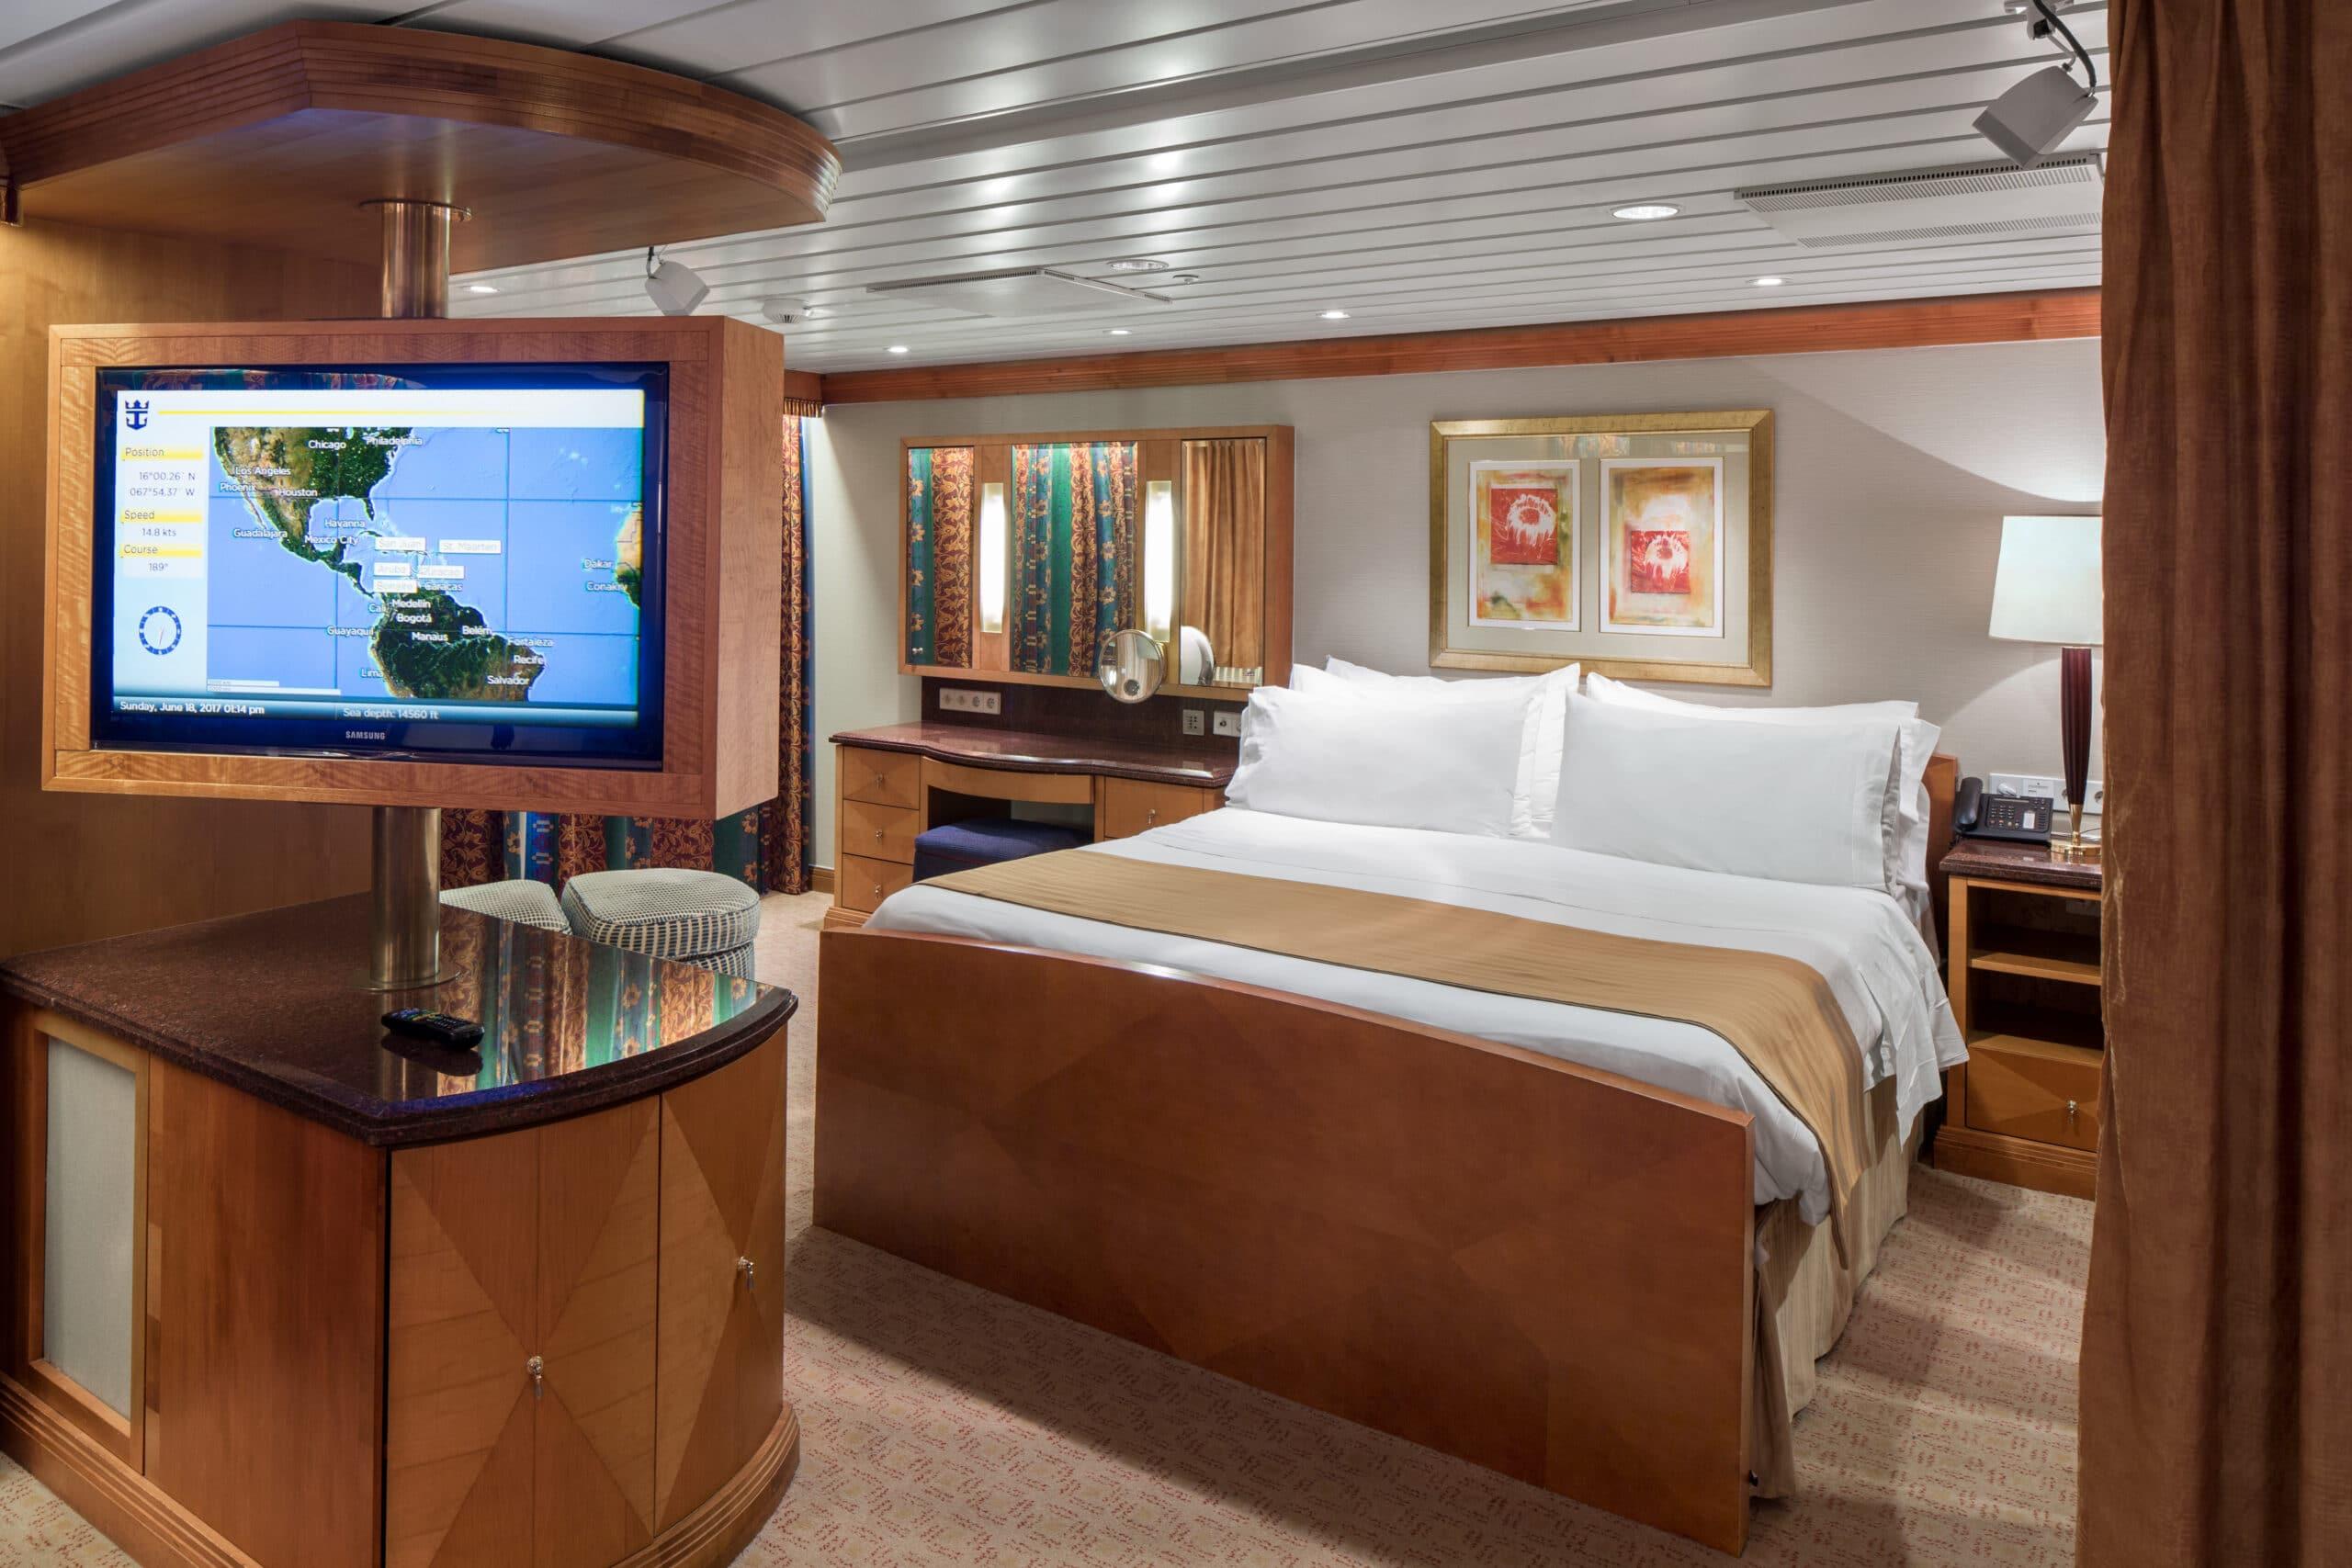 Royal-Caribbean-International-Adventure-of-the-Seas-schip-cruiseschip-categorie-OS-Owner-Suite